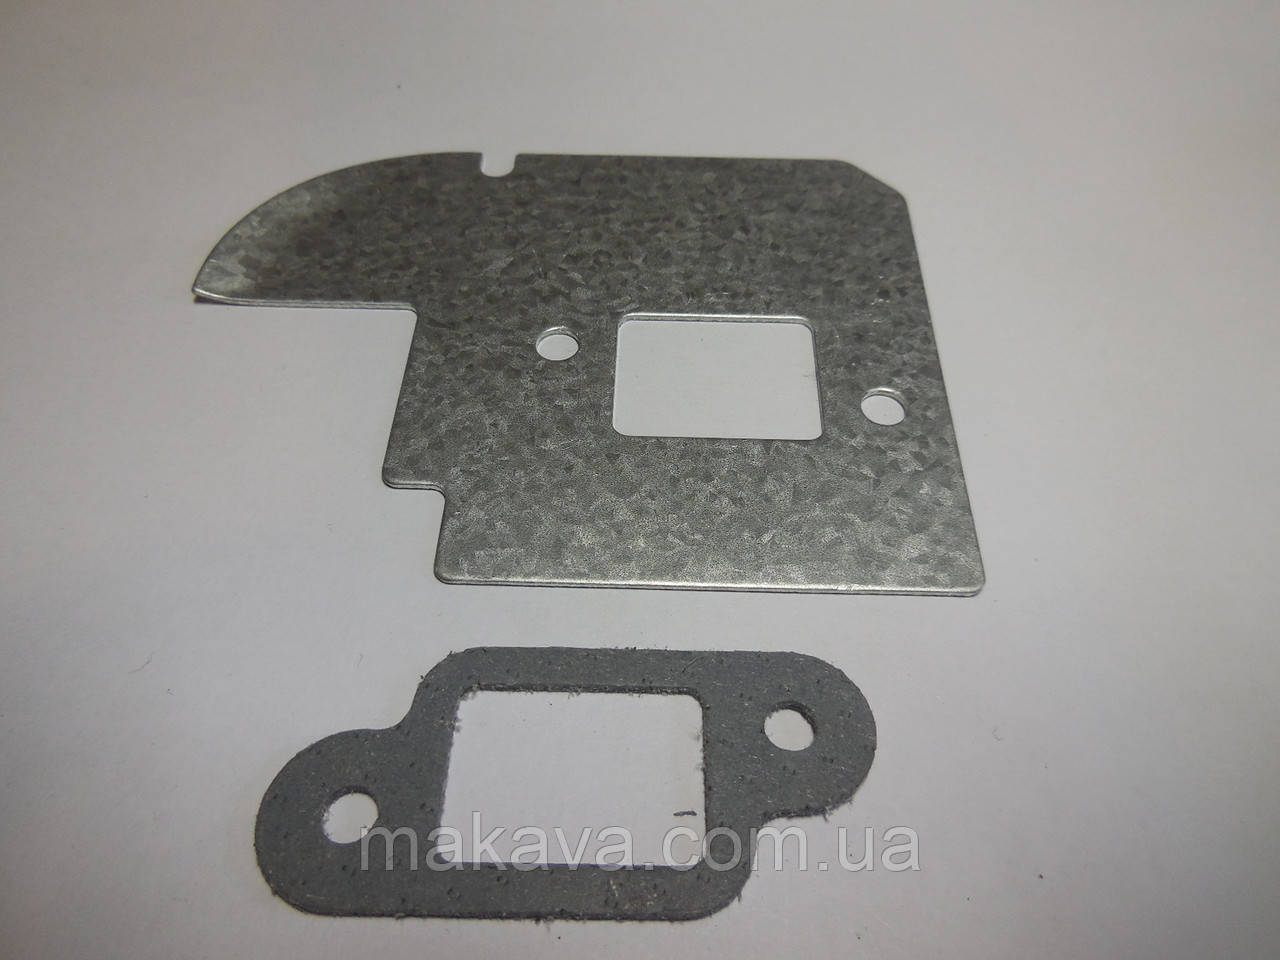 Пластина глушителя с прокладкой St MS-180